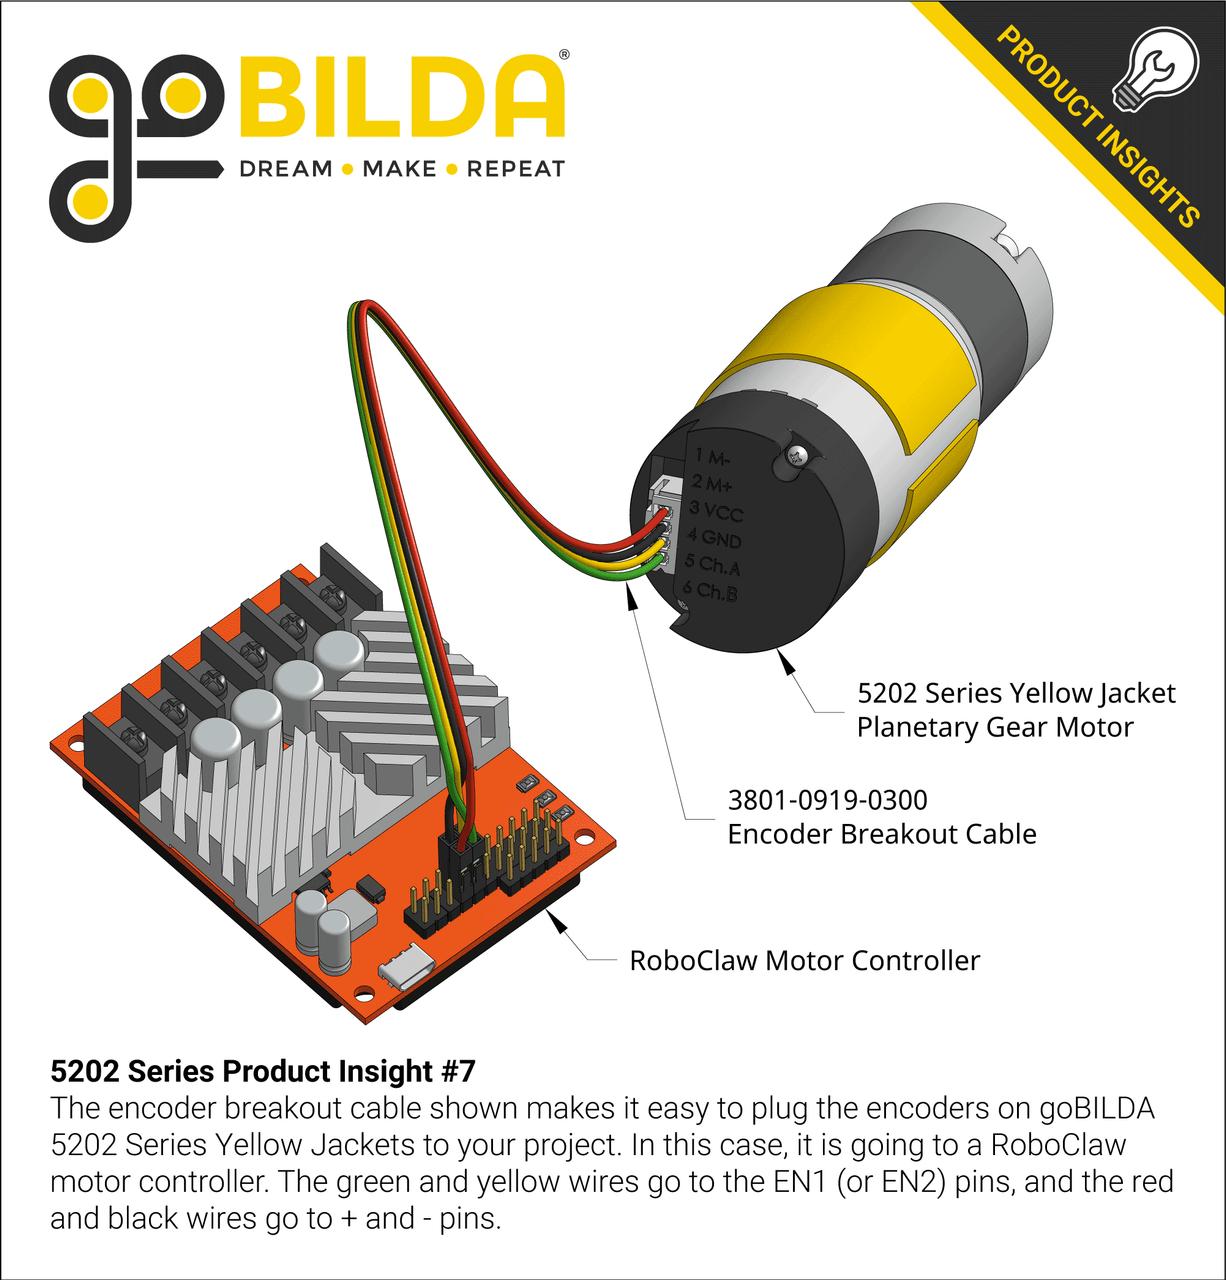 encoder 7 pole wiring diagram 5202 series yellow jacket planetary gear motor  139 1 ratio  43  yellow jacket planetary gear motor